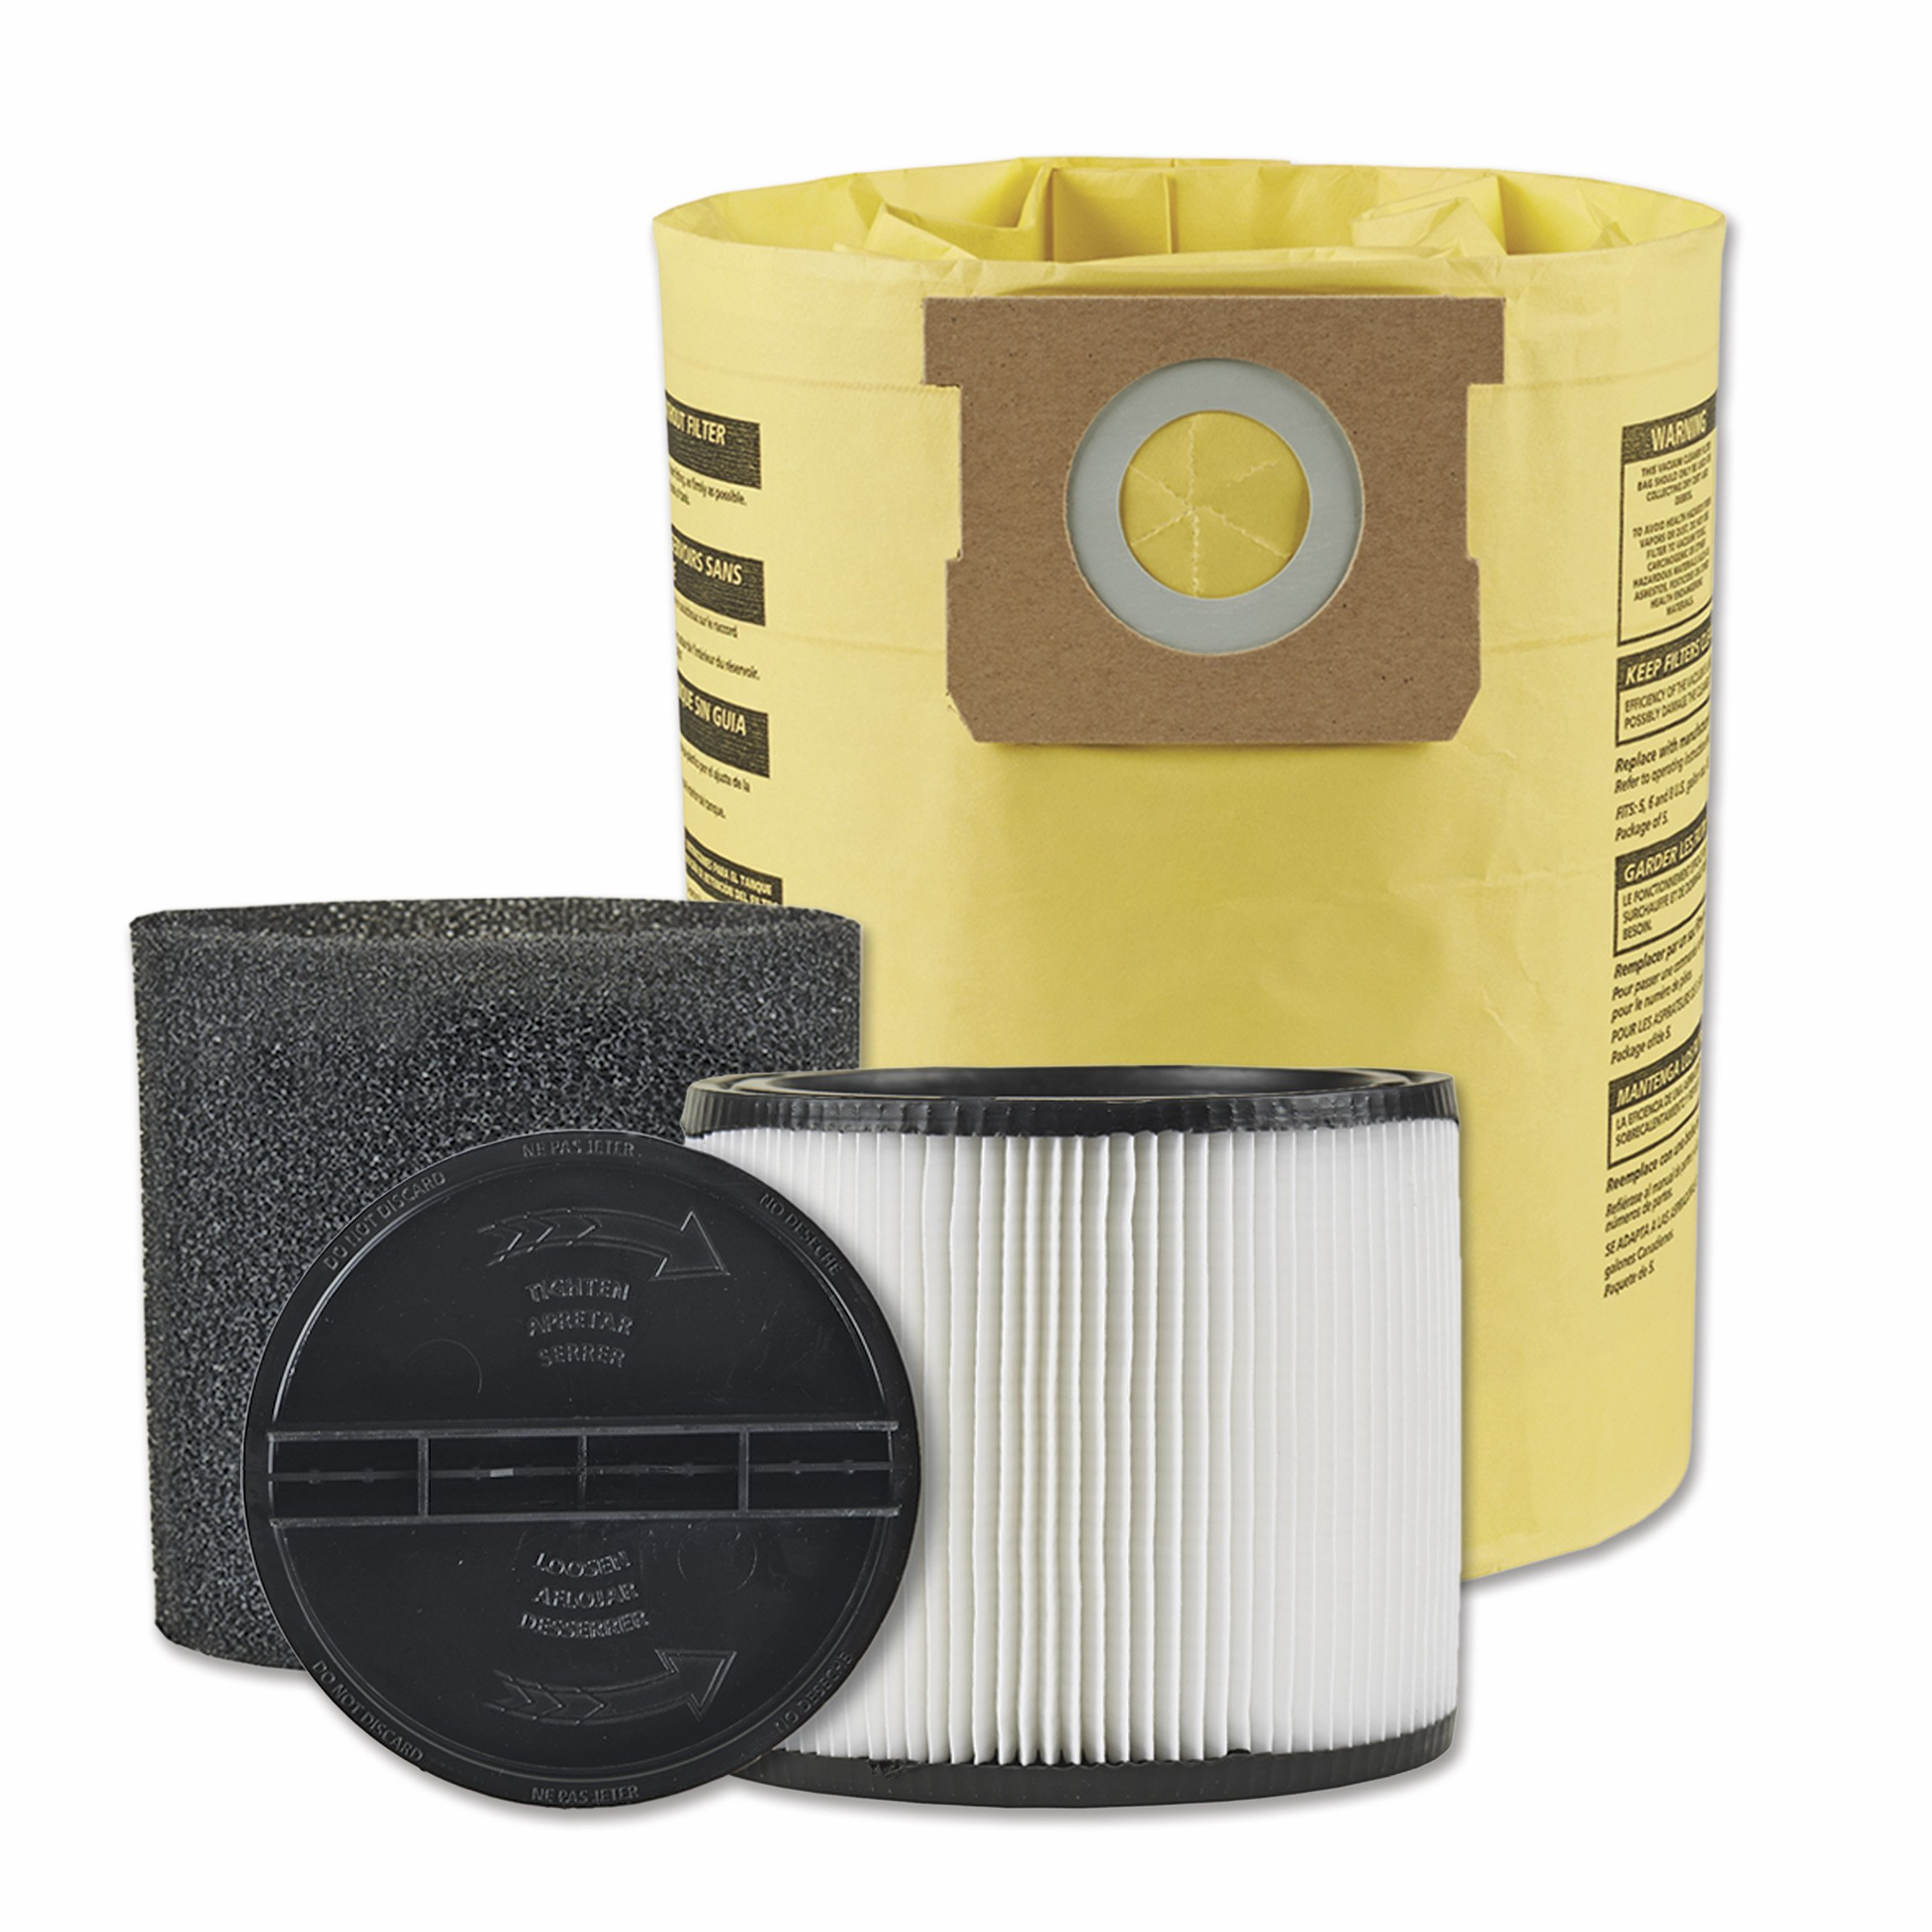 Shop-Vac 9604610 6.5 Peak HP wet Dry Vacuum with Built in Pump, 16-Gallon by Shop-Vac (Image #7)